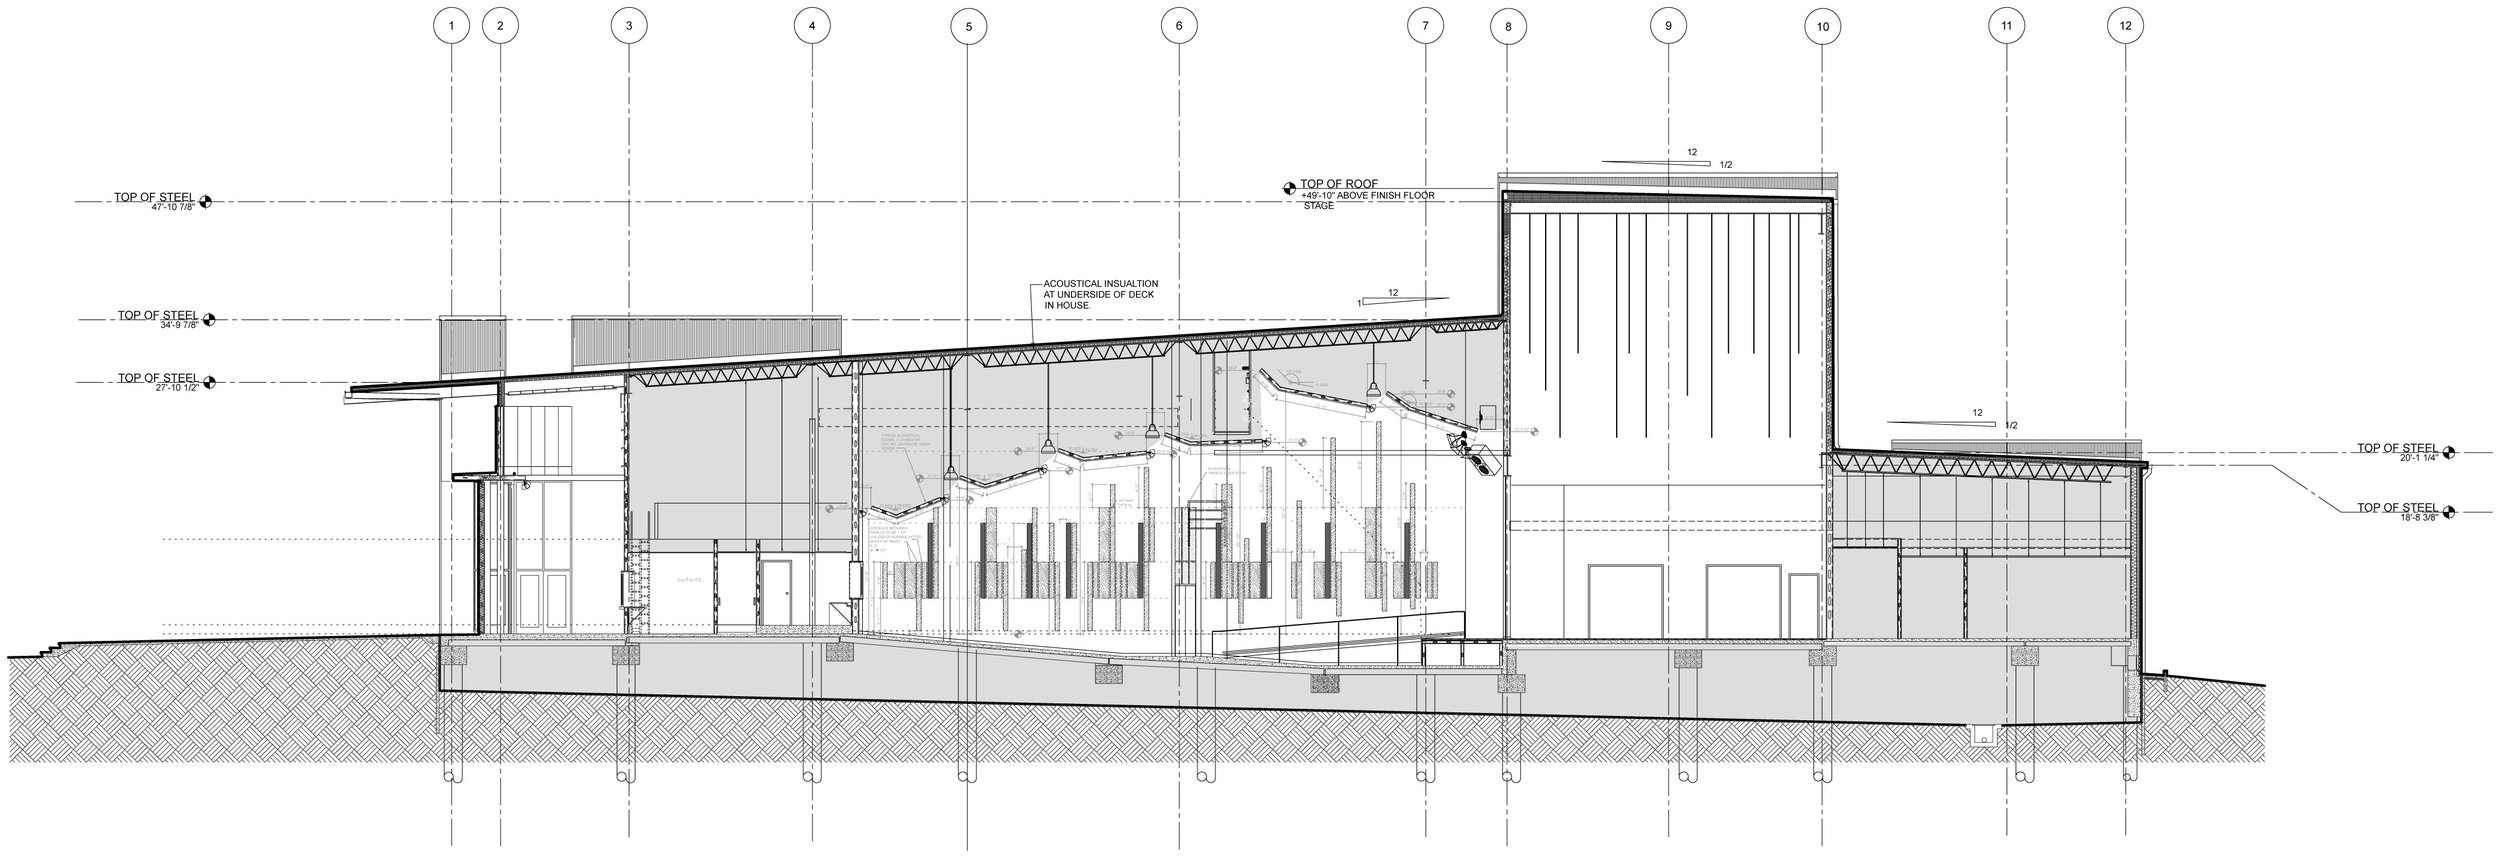 LBJ Theater Section.jpg